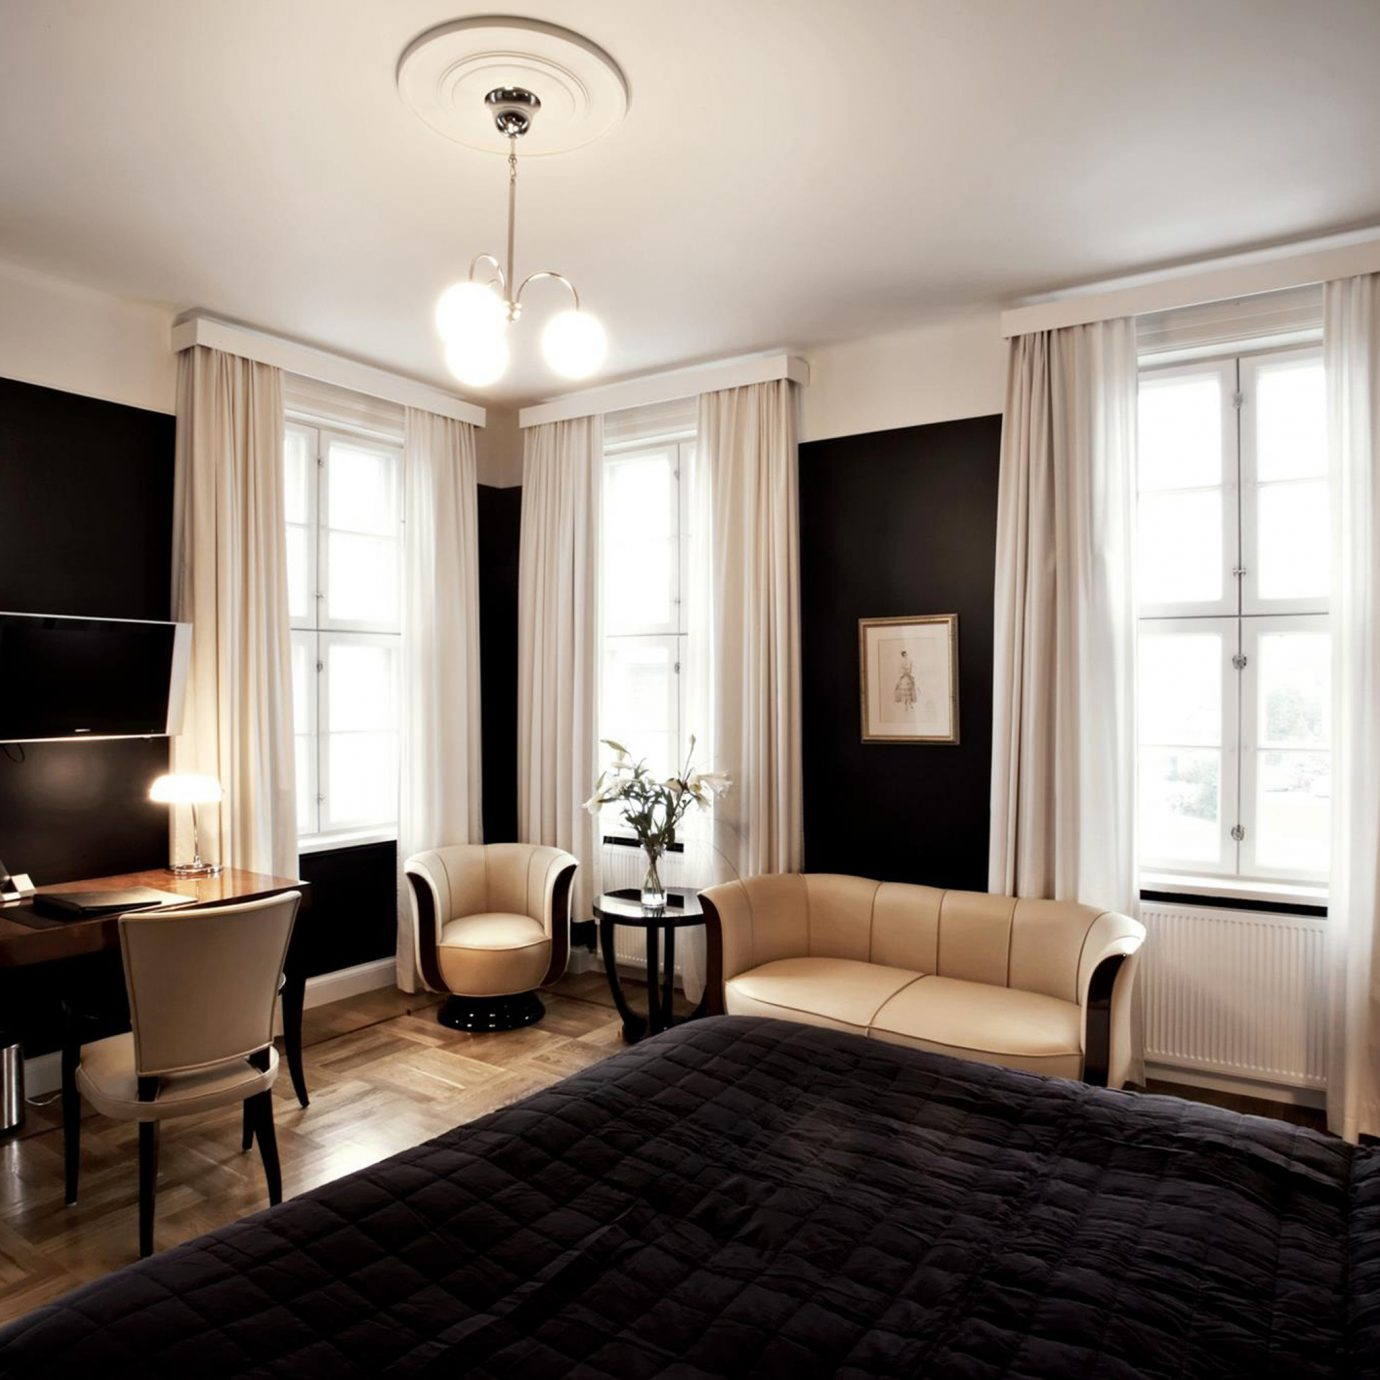 Bedroom Boutique Hip Hotels Iceland Luxury Modern property living room Suite home hardwood nice